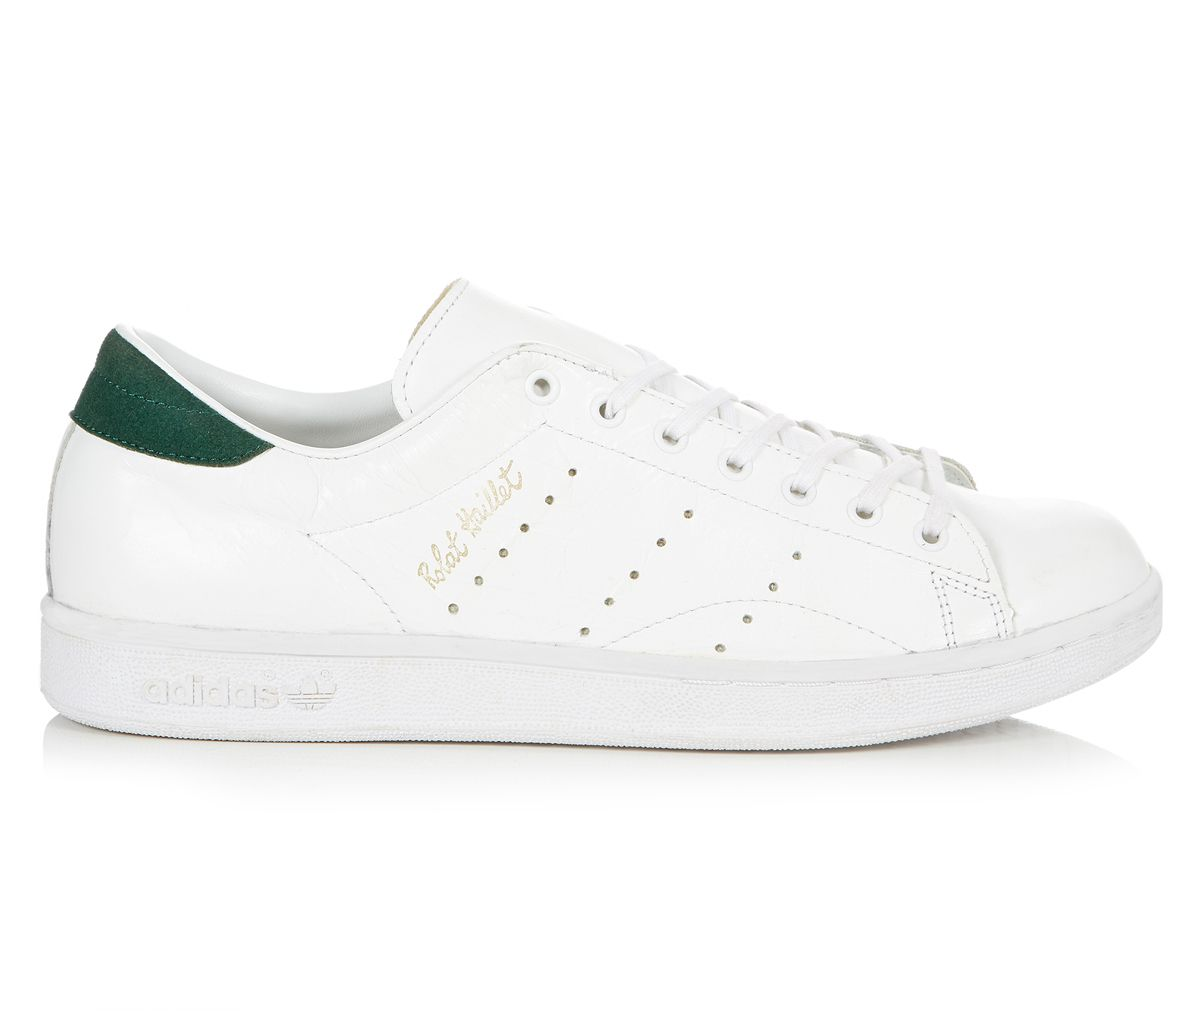 low priced a367f 3ab39 ADIDAS HAILLET | Lépő | Adidas, Adidas sneakers, Adidas stan ...